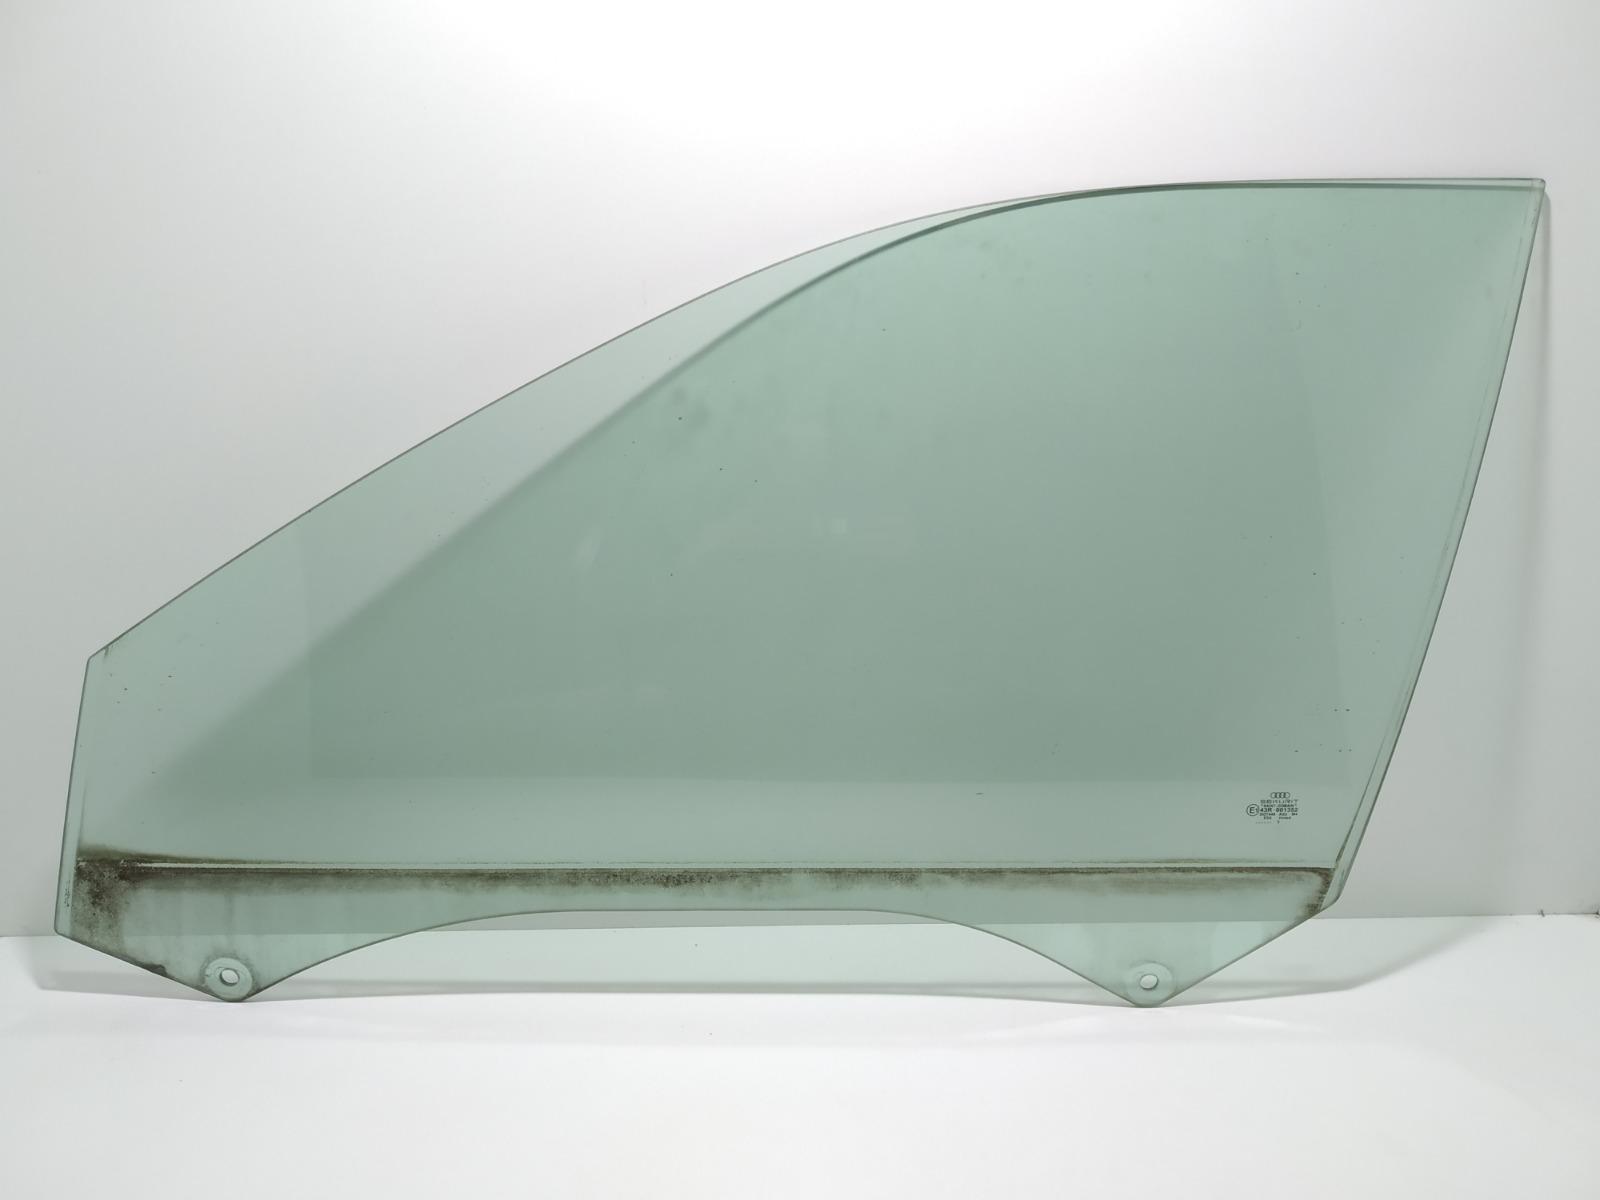 Стекло двери передней левой Audi A3 8L 1.8 I 2003 (б/у)